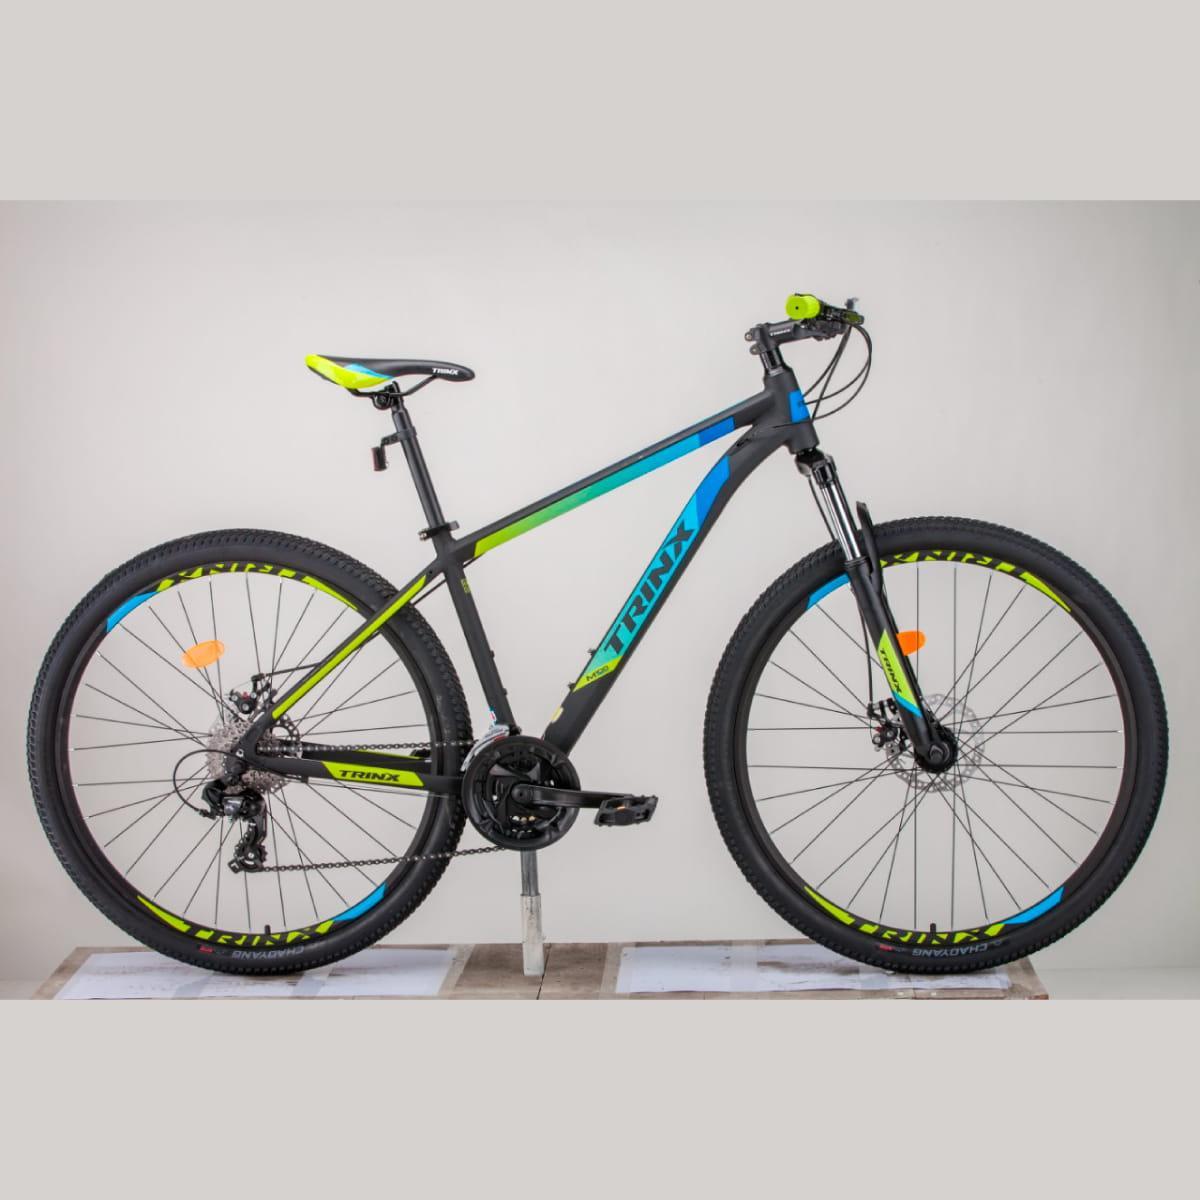 Bike Trinx Aro 29 M100 MAX Preto Azul